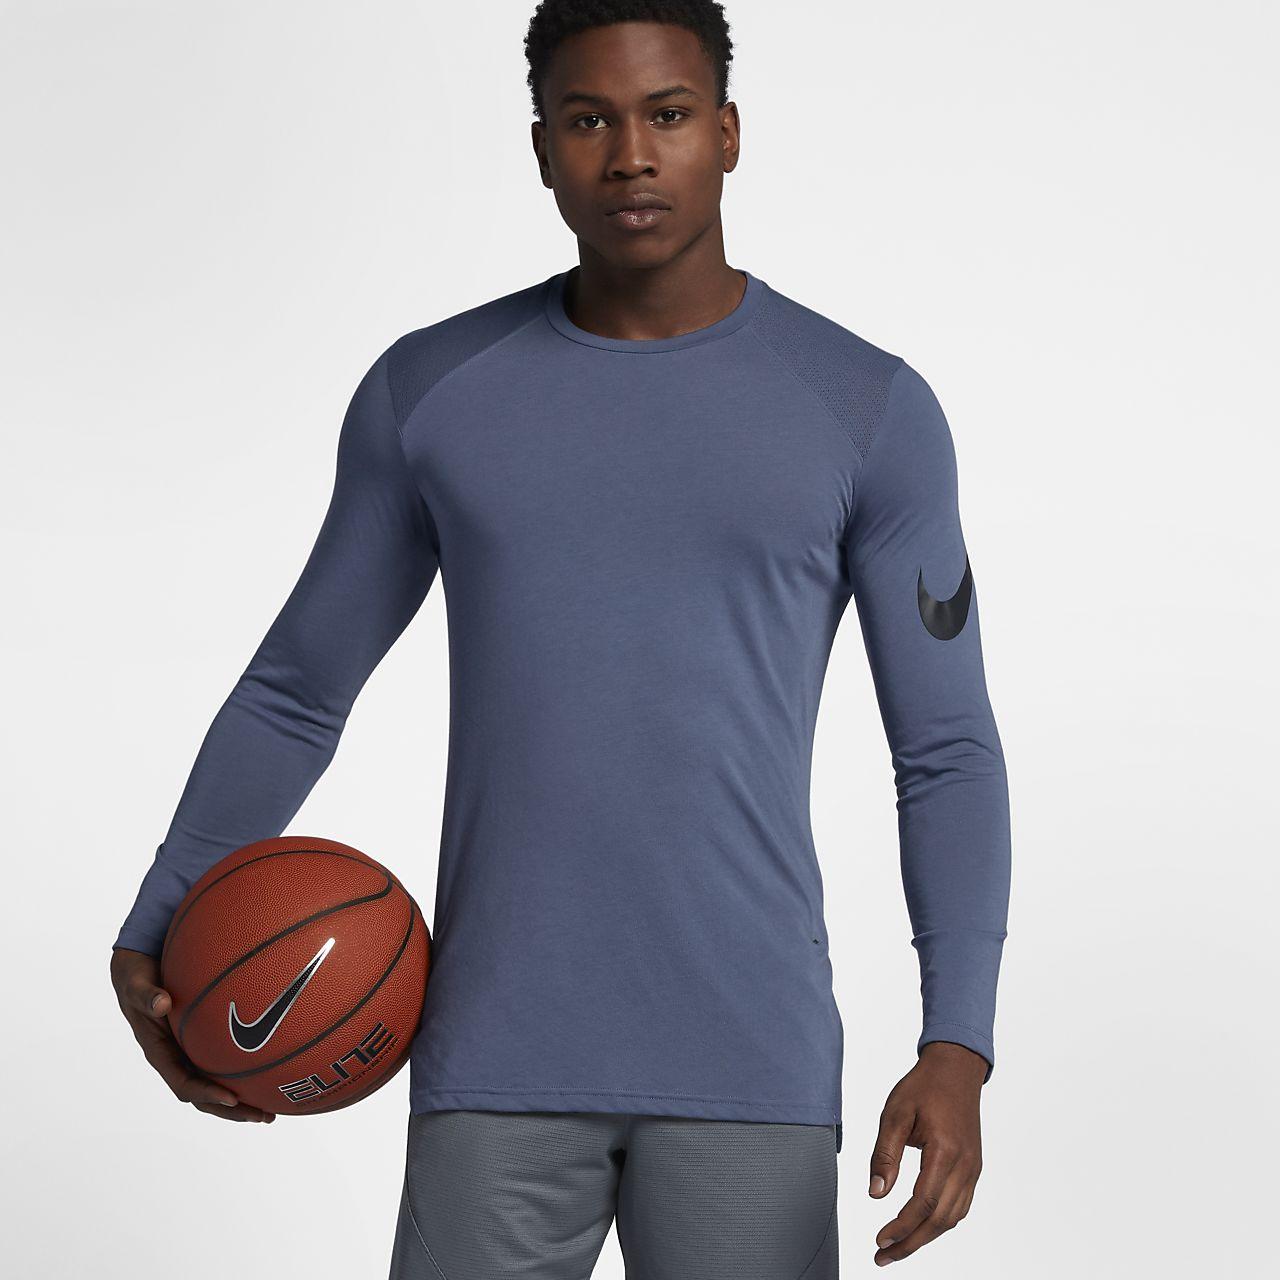 ffd39522b5 Nike Breathe Elite Camiseta de baloncesto de manga larga - Hombre ...